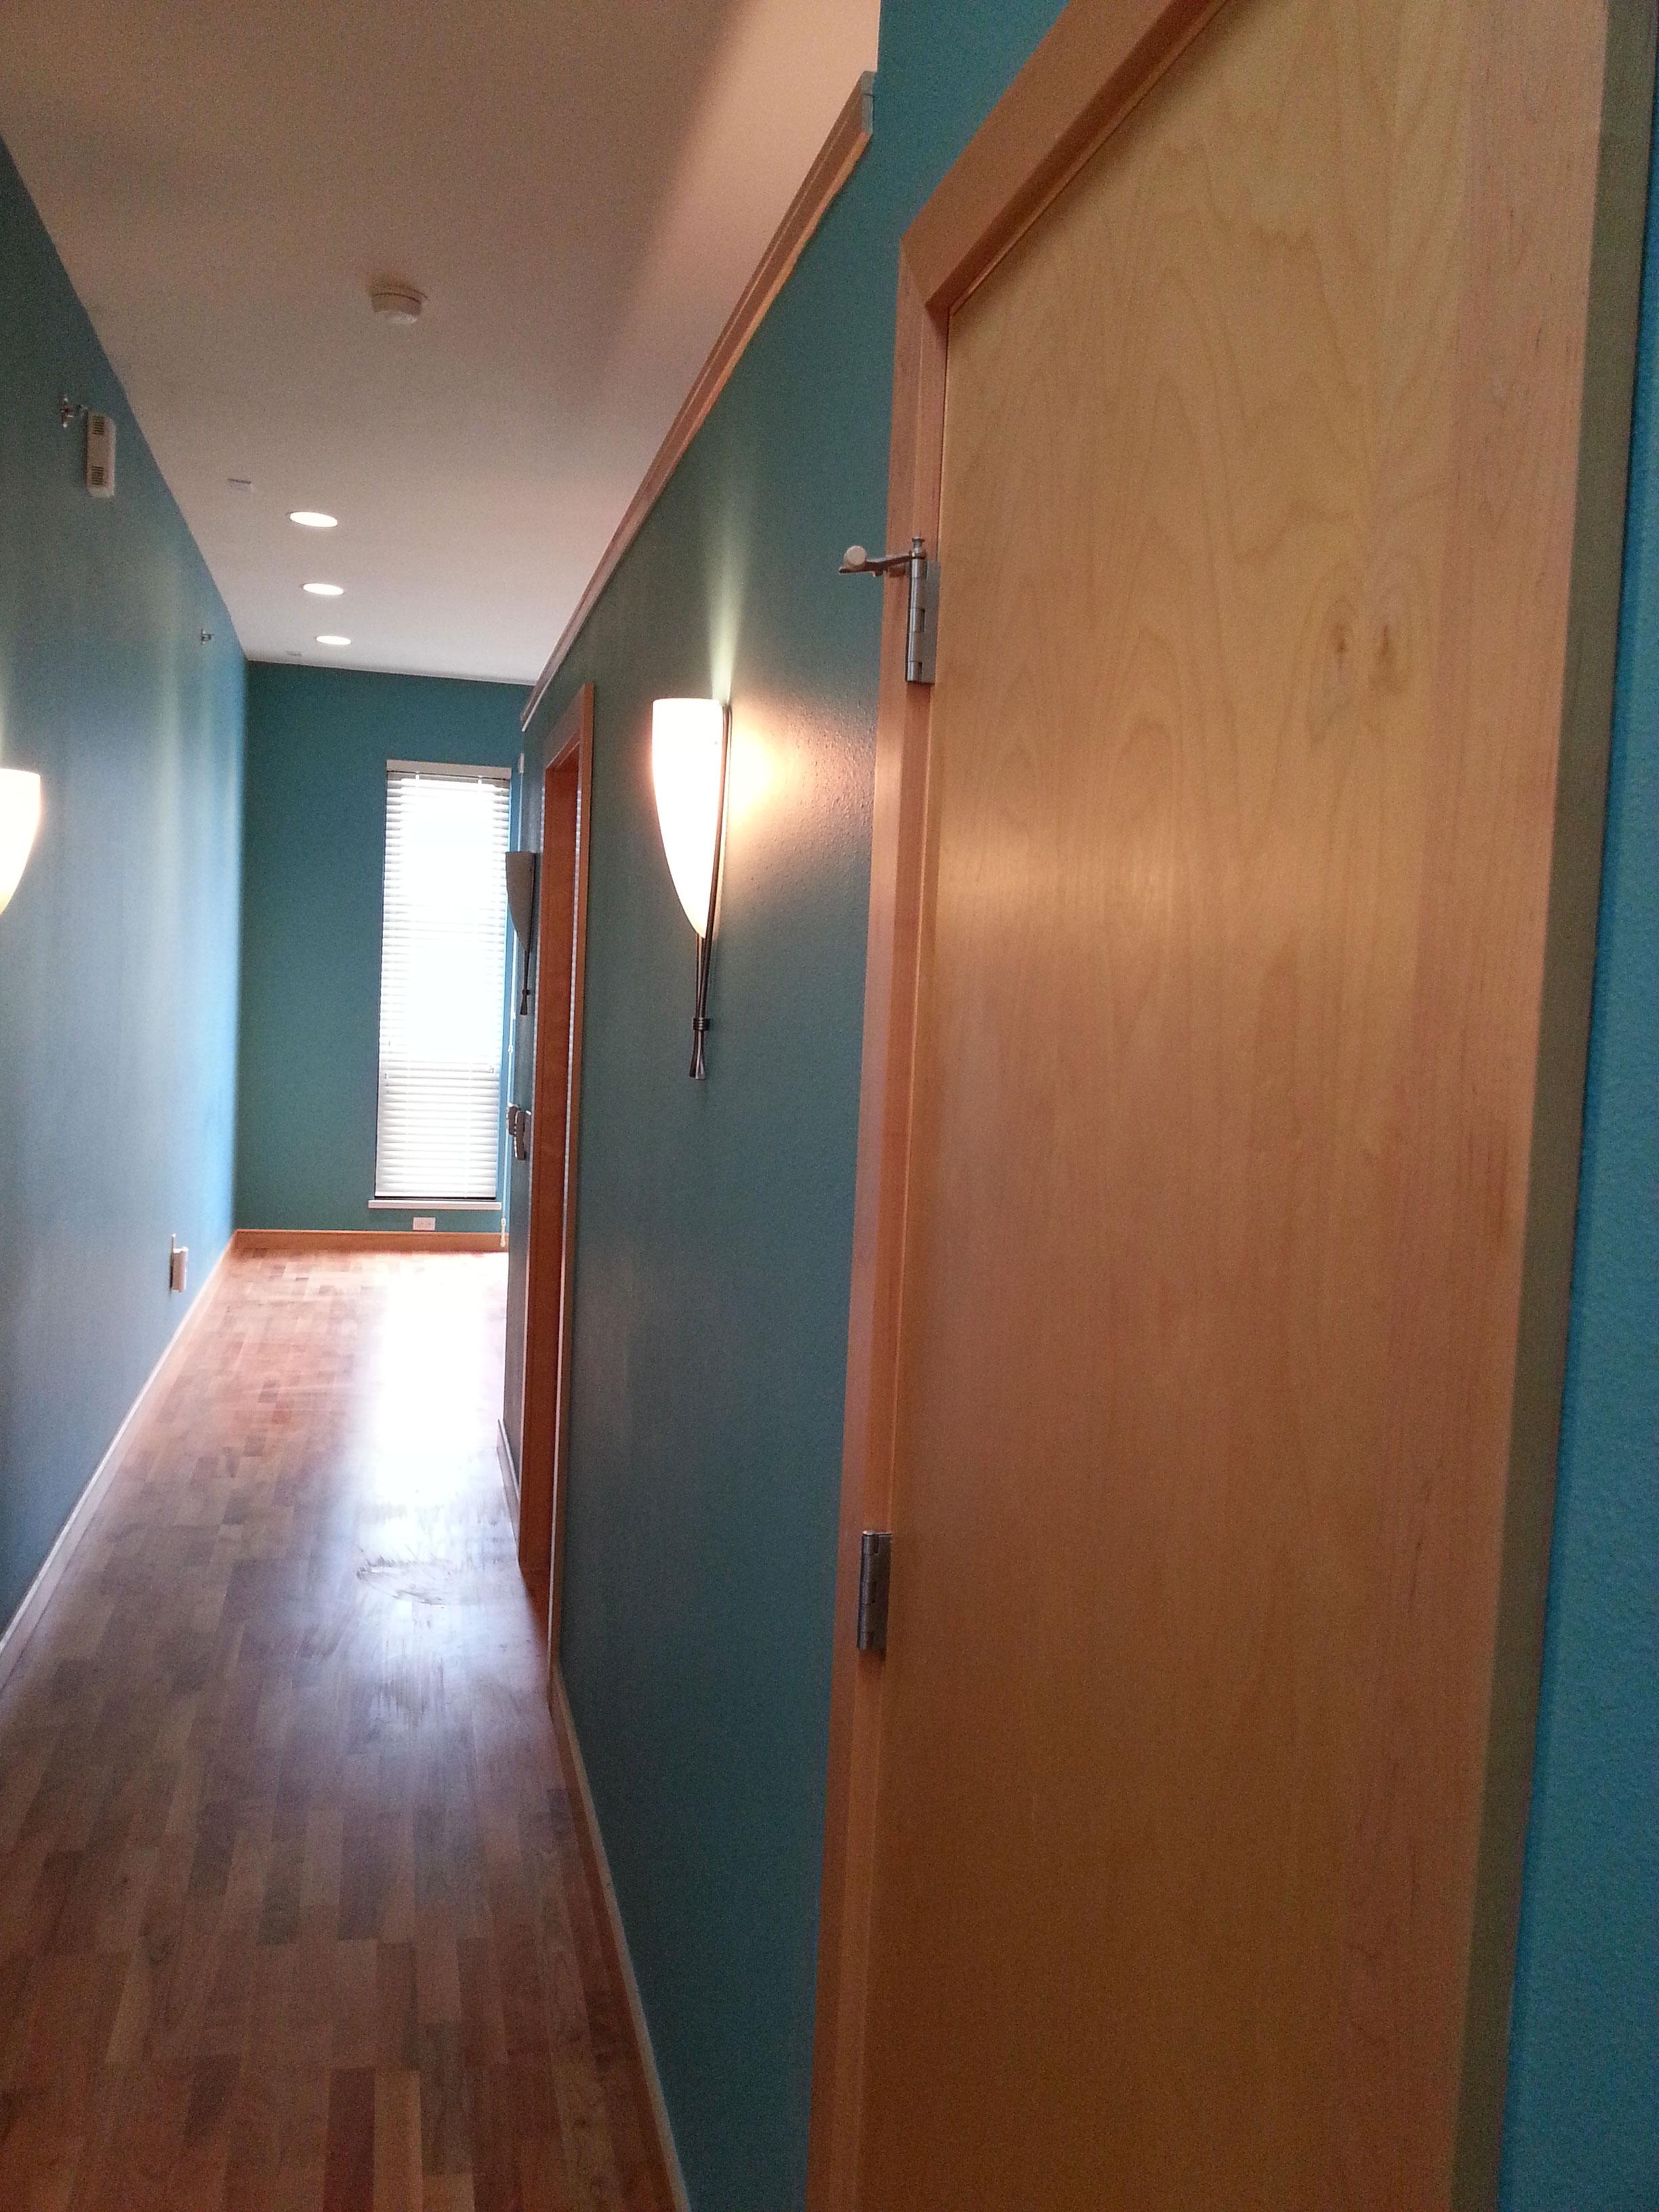 megna-painting-interior-condos.jpg